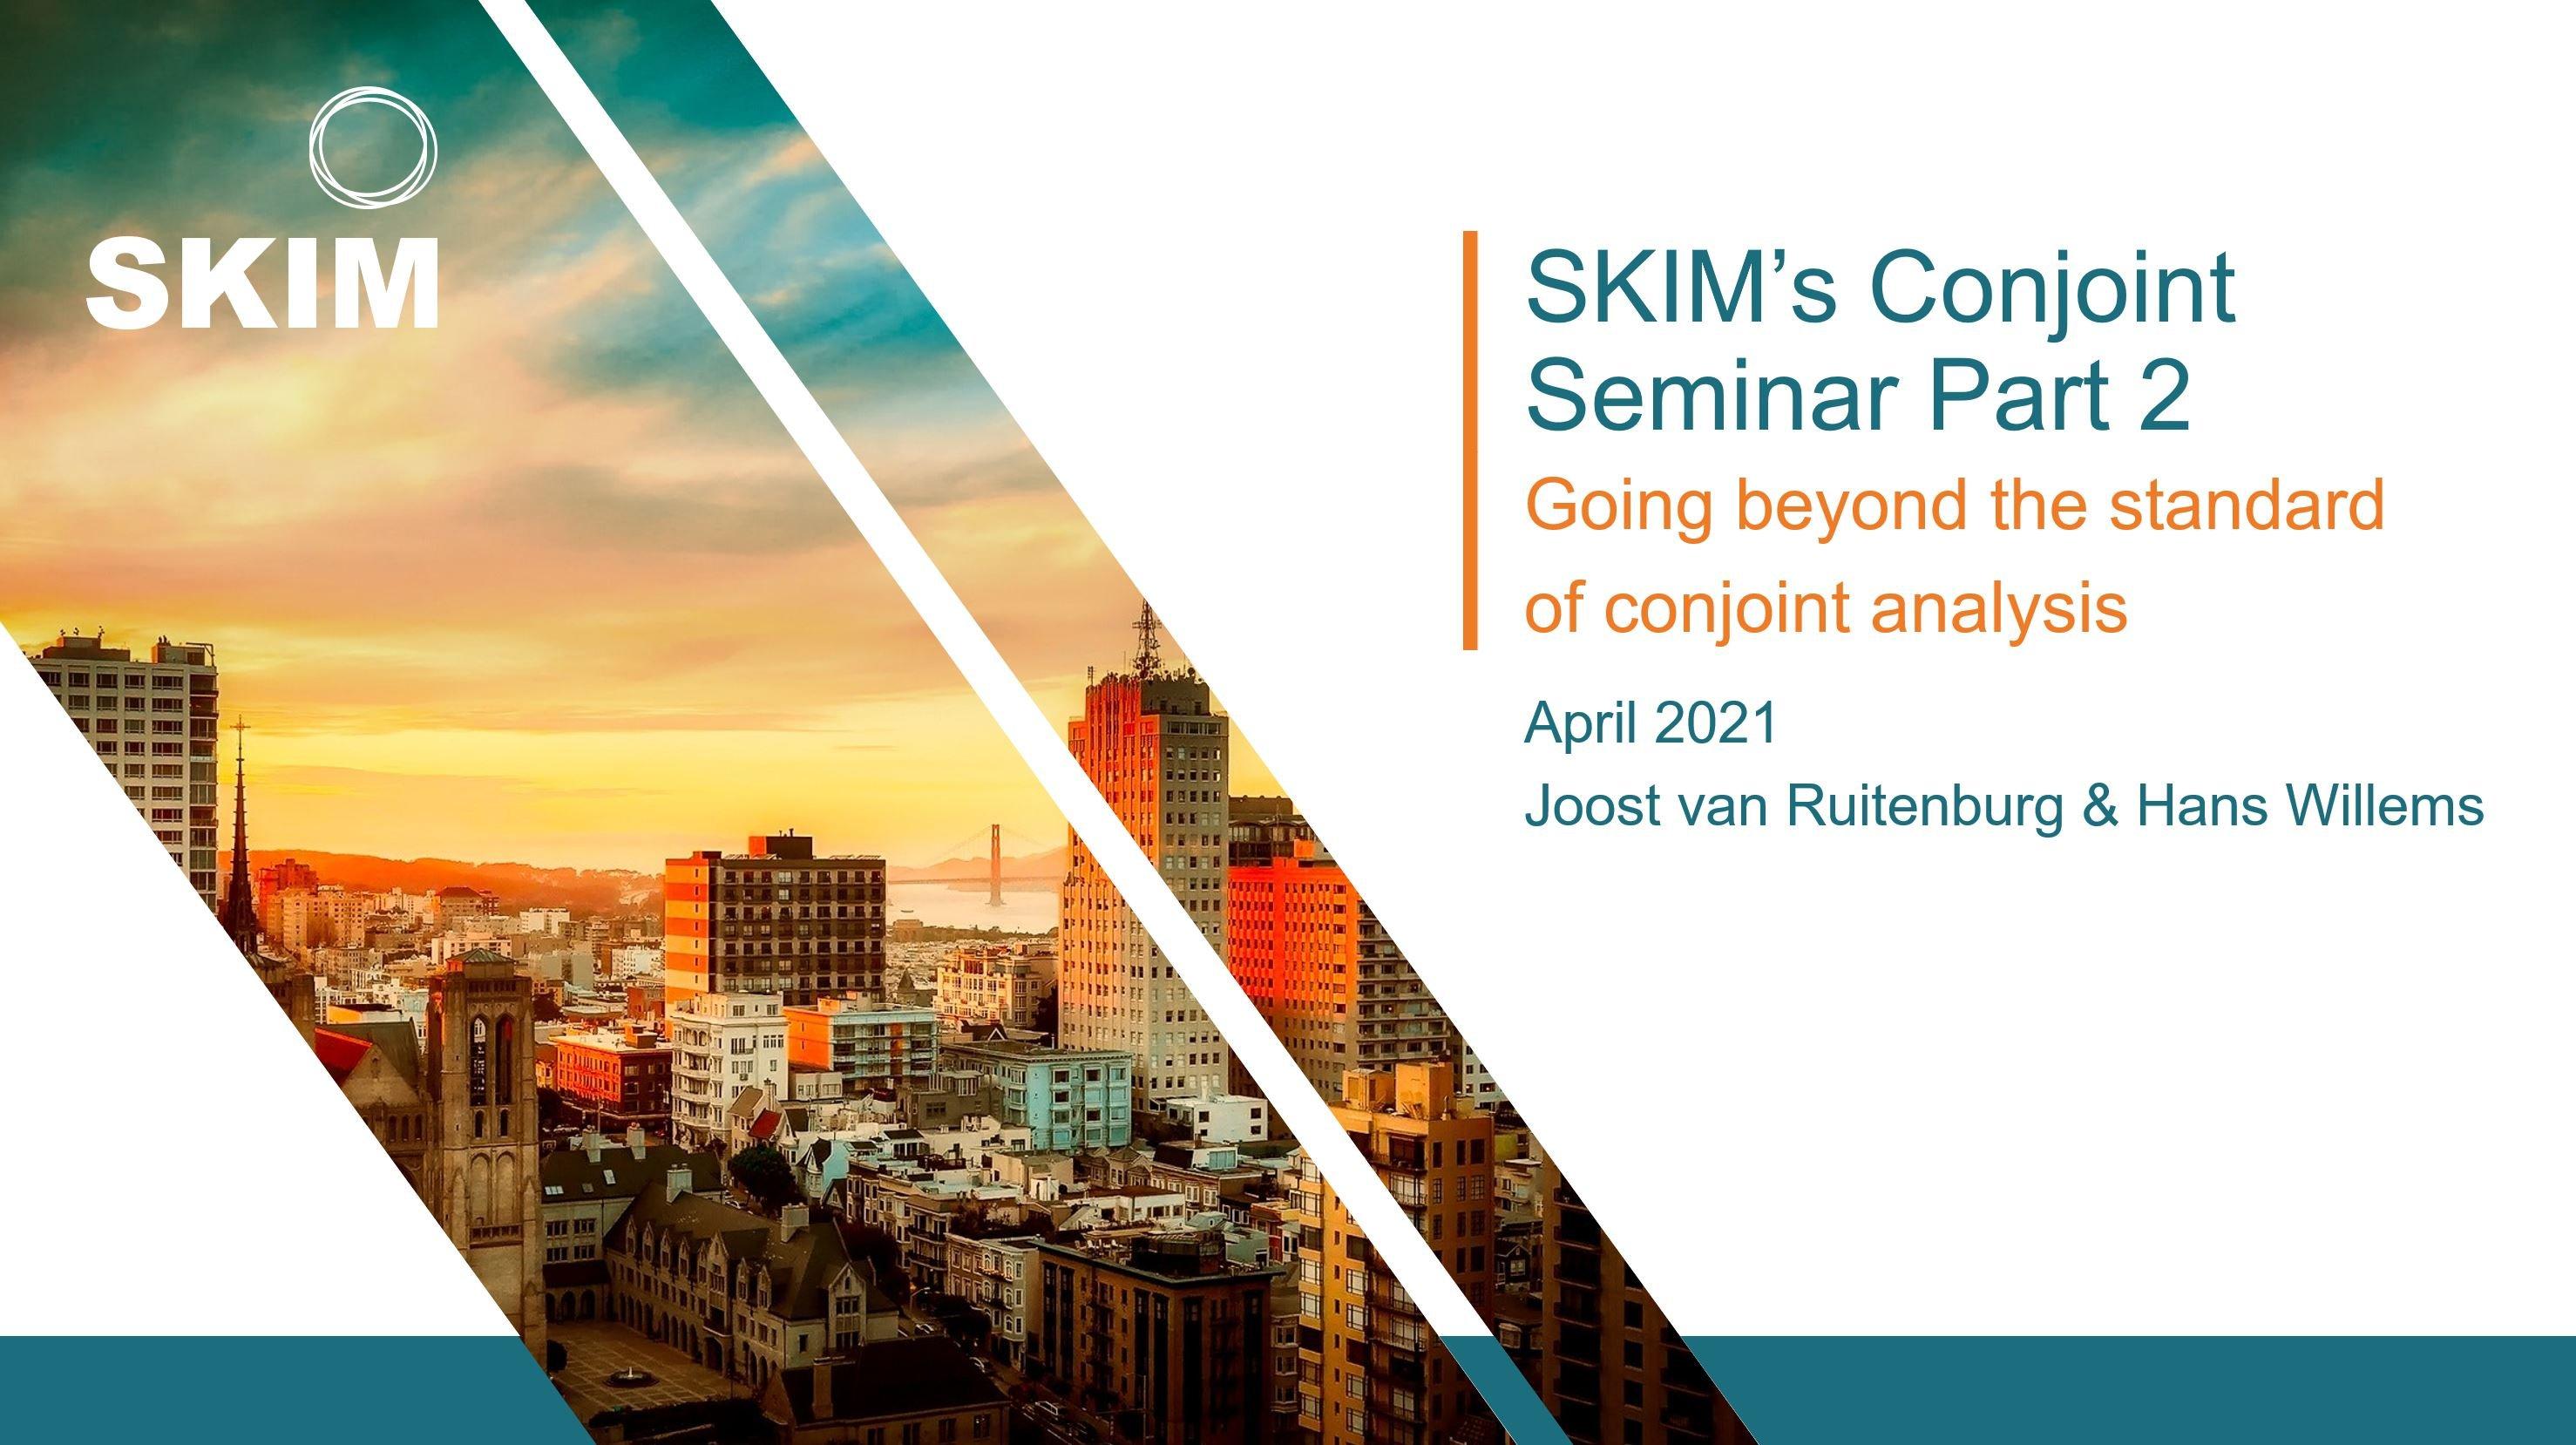 SKIM Conjoint Seminar pt 2